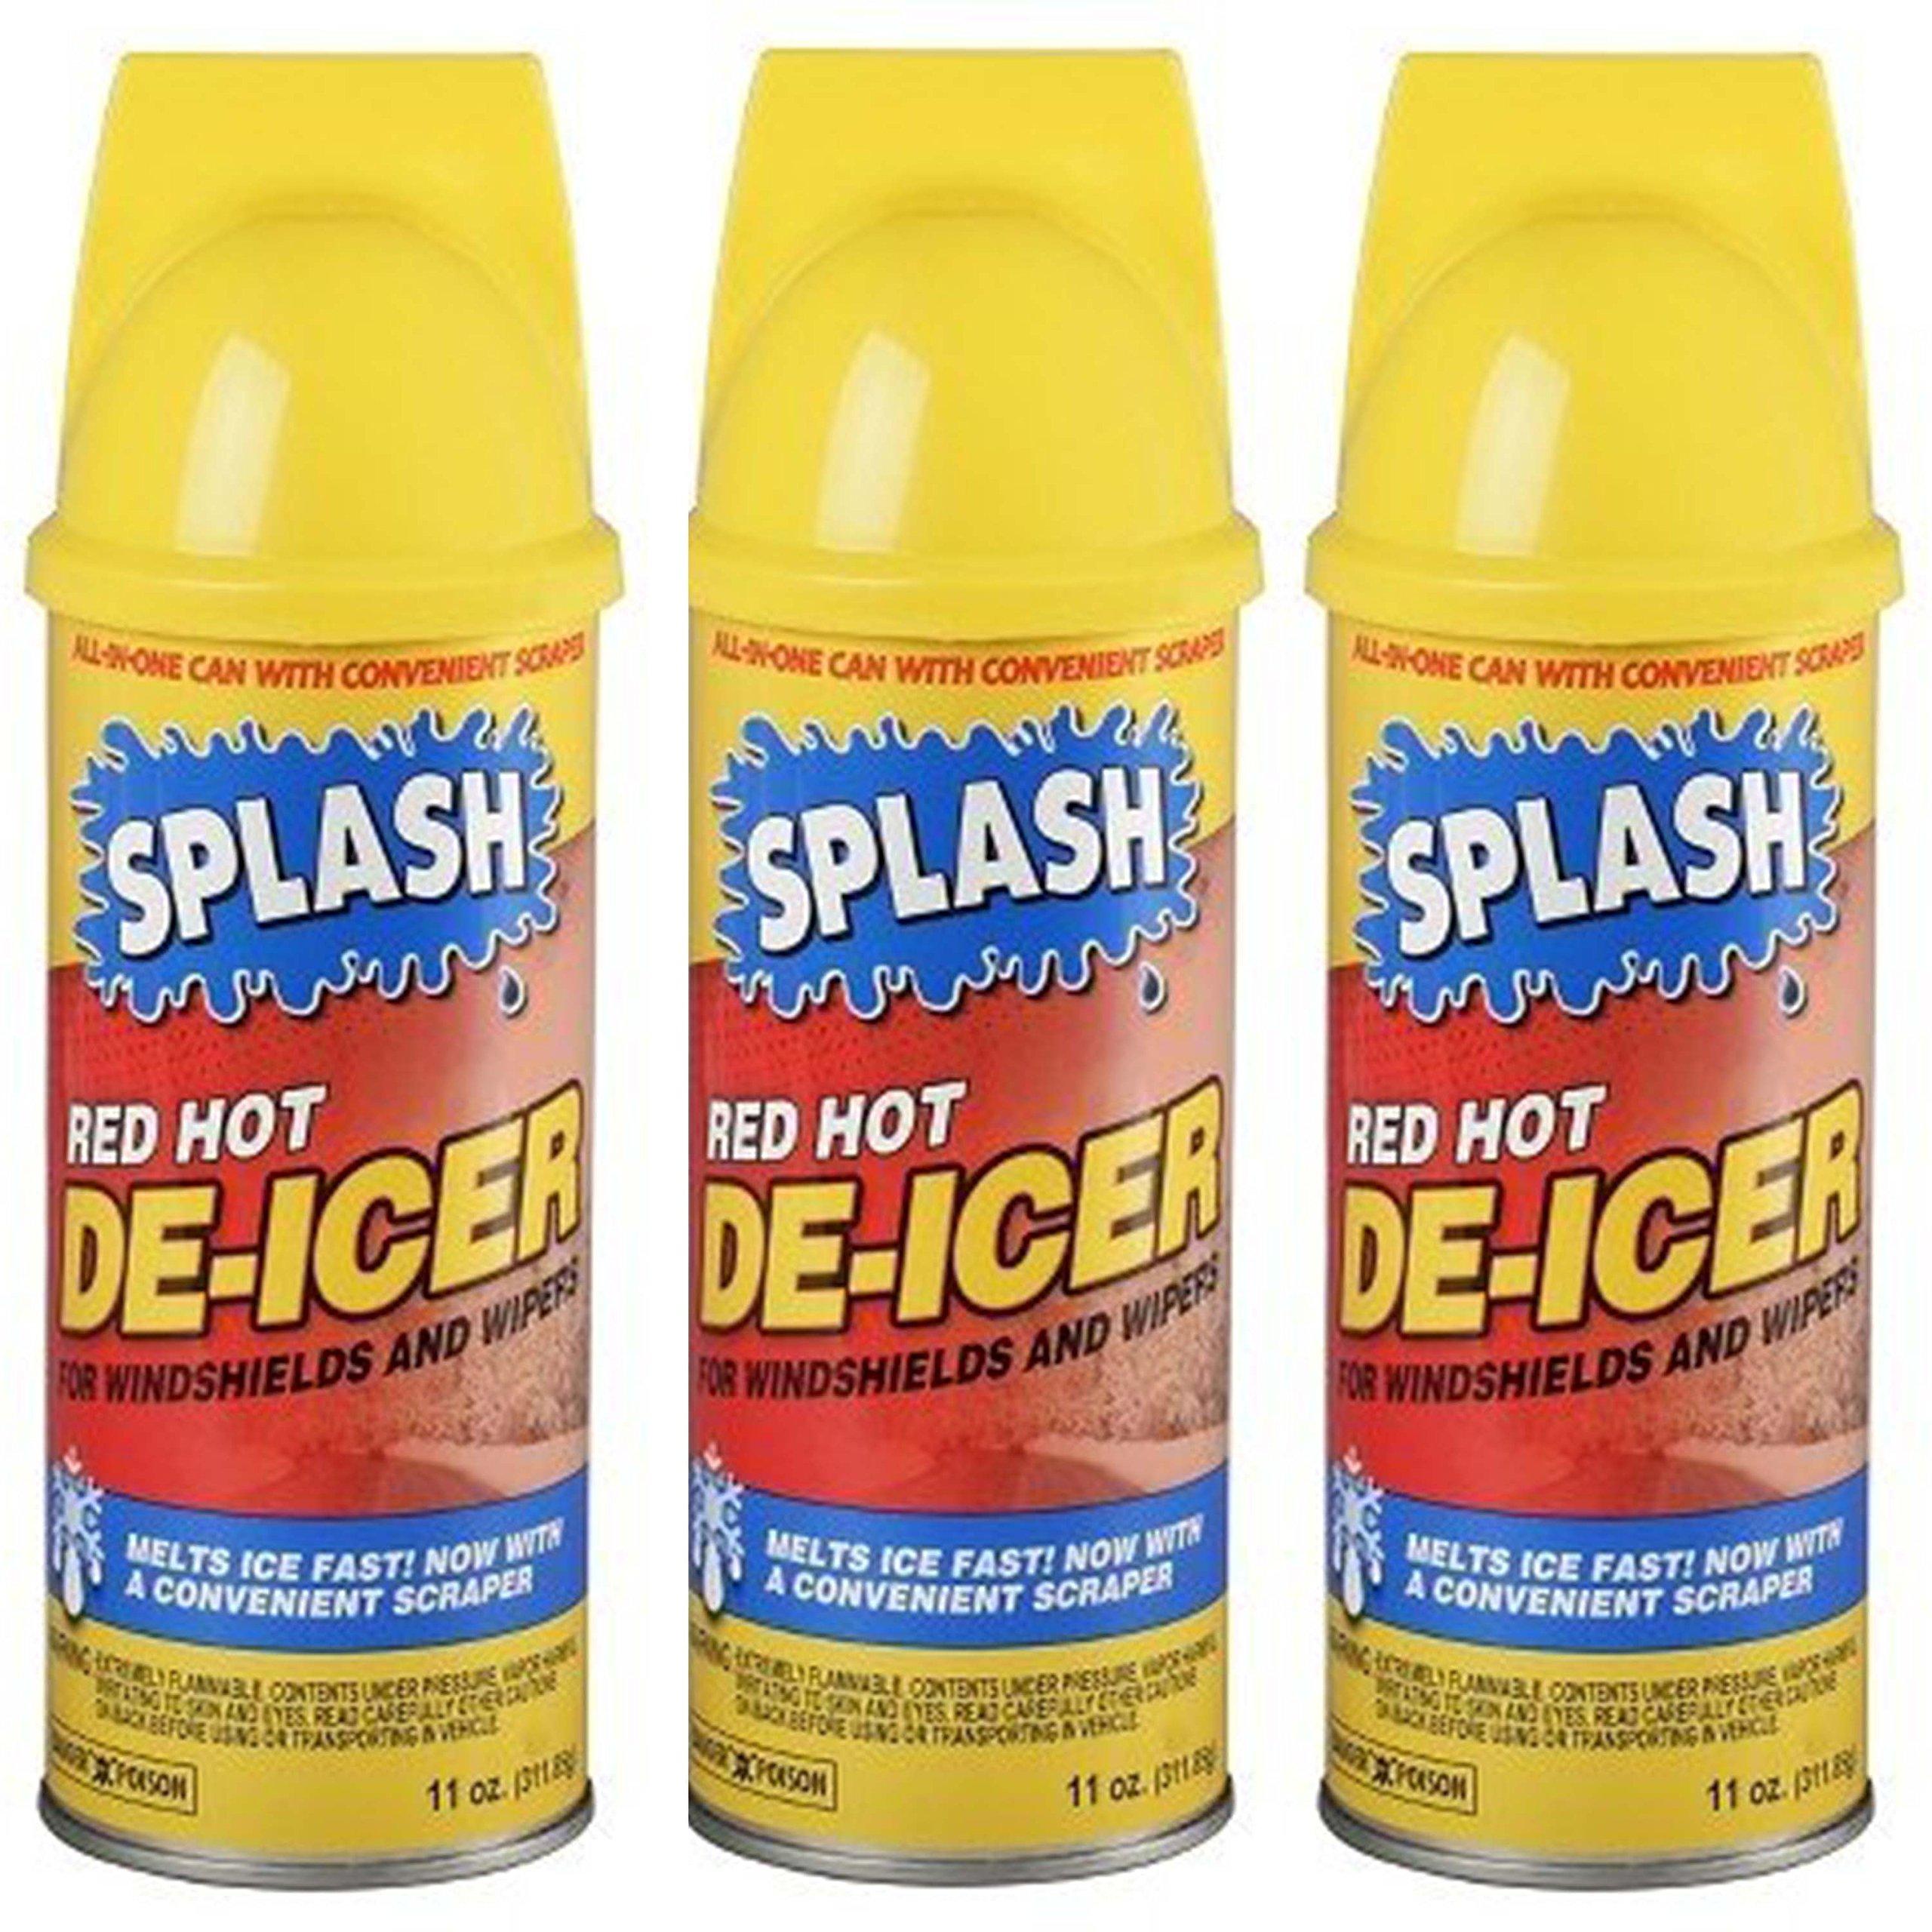 Splash Red Hot De-icer Aerosol Spray, 11 Ounces (Pack of 3) by SPLASH